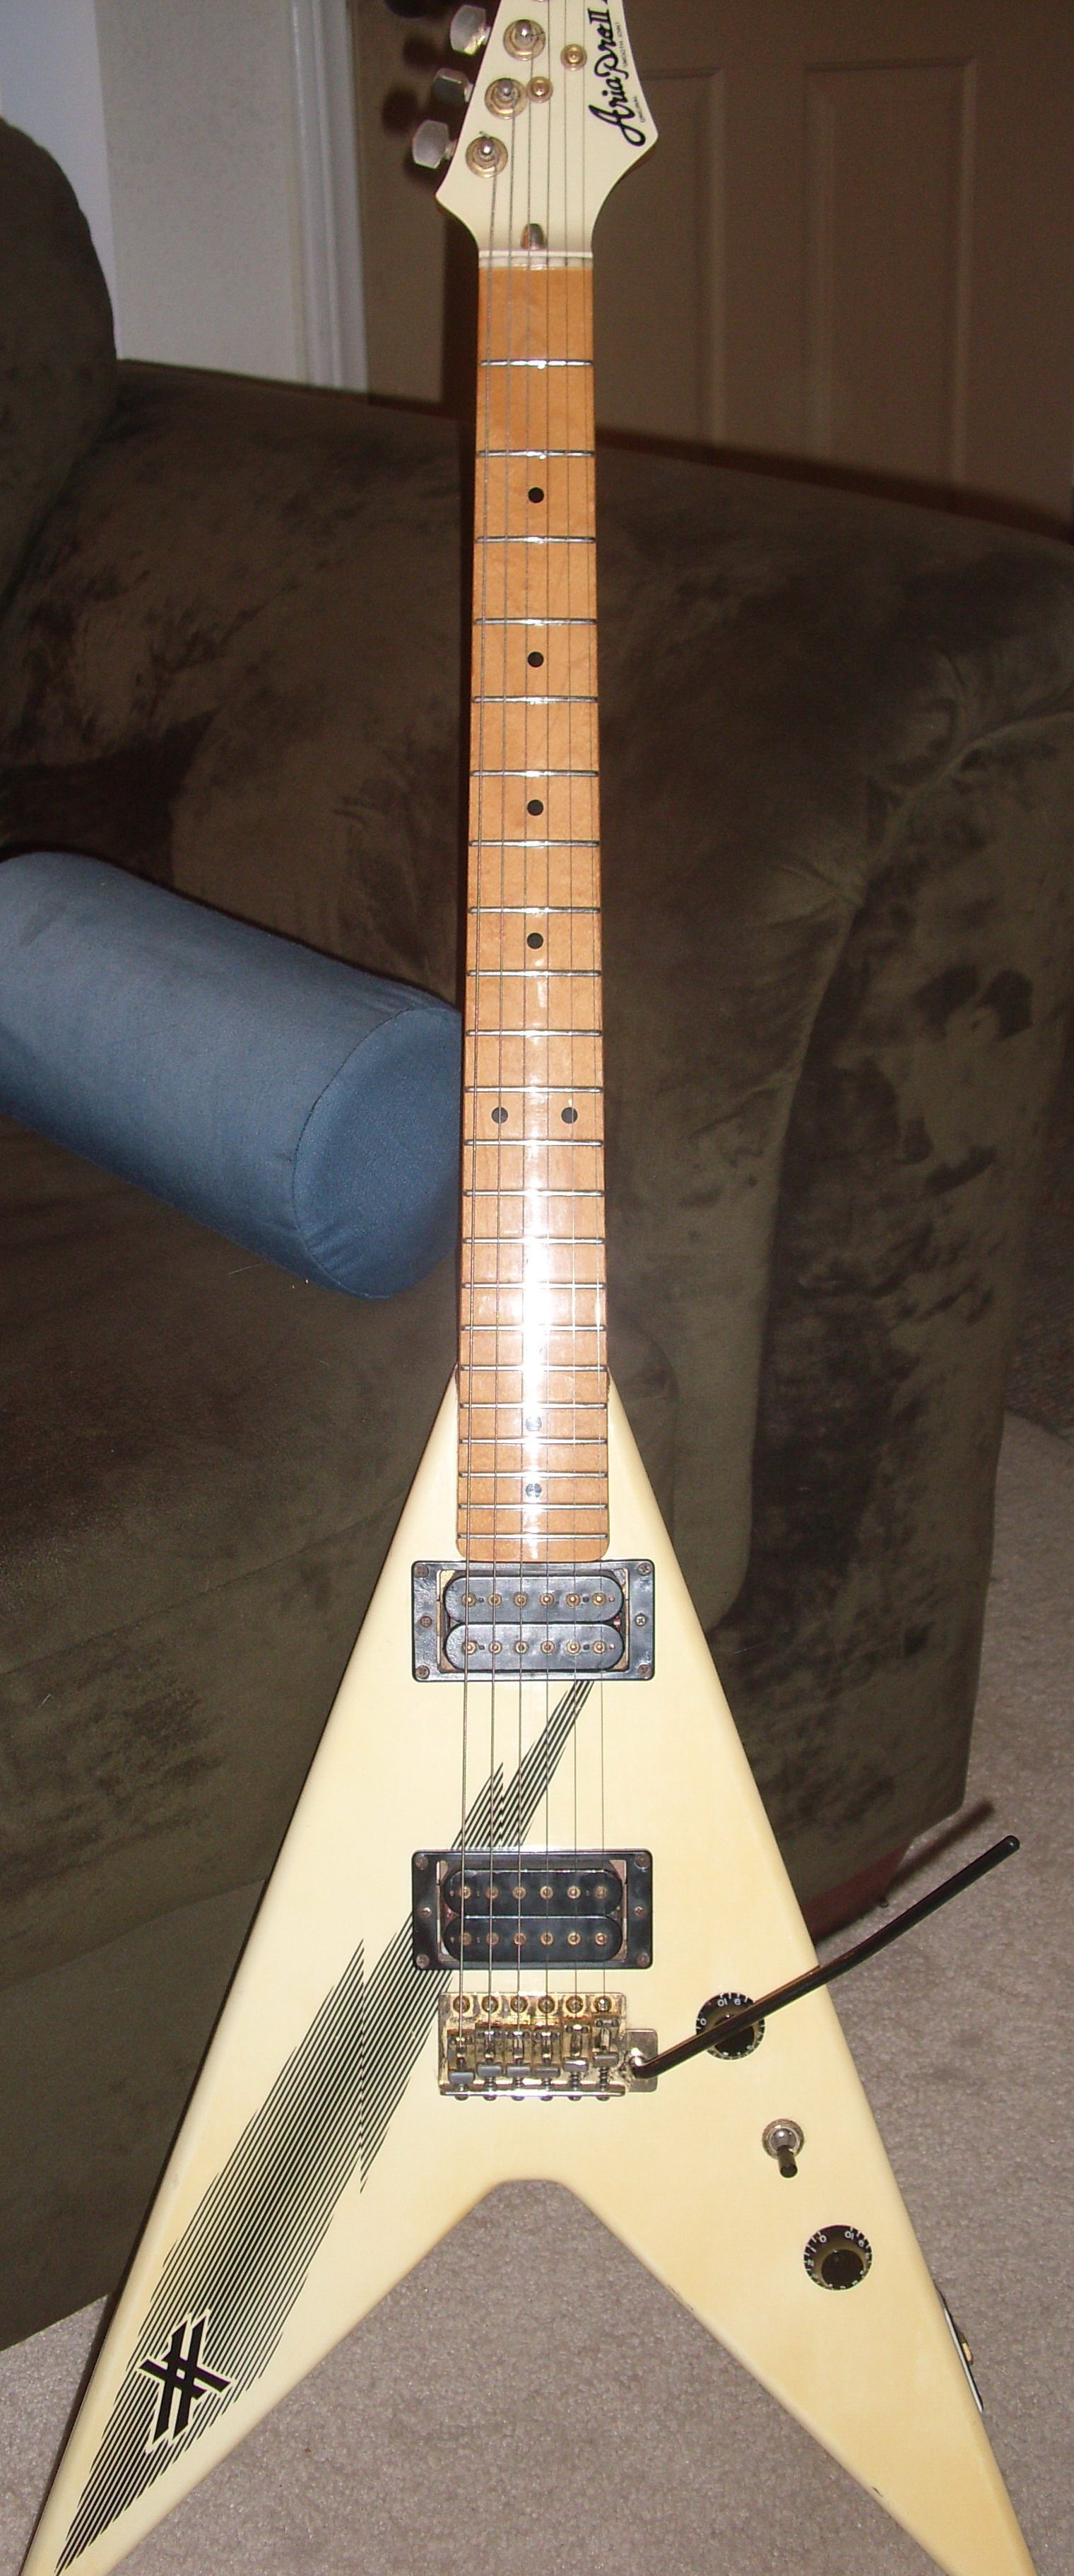 Thunderhorse guitar sweepstakes contest